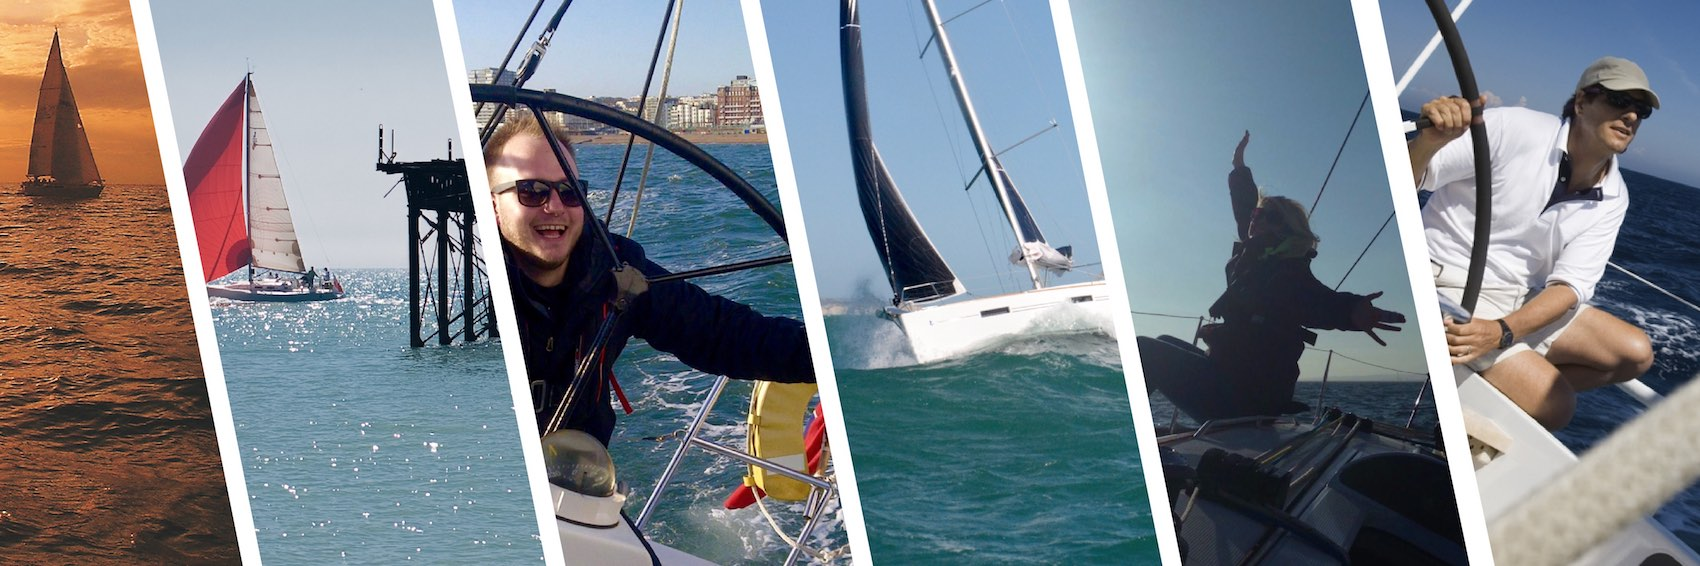 yacht-sailing-brighton-banner